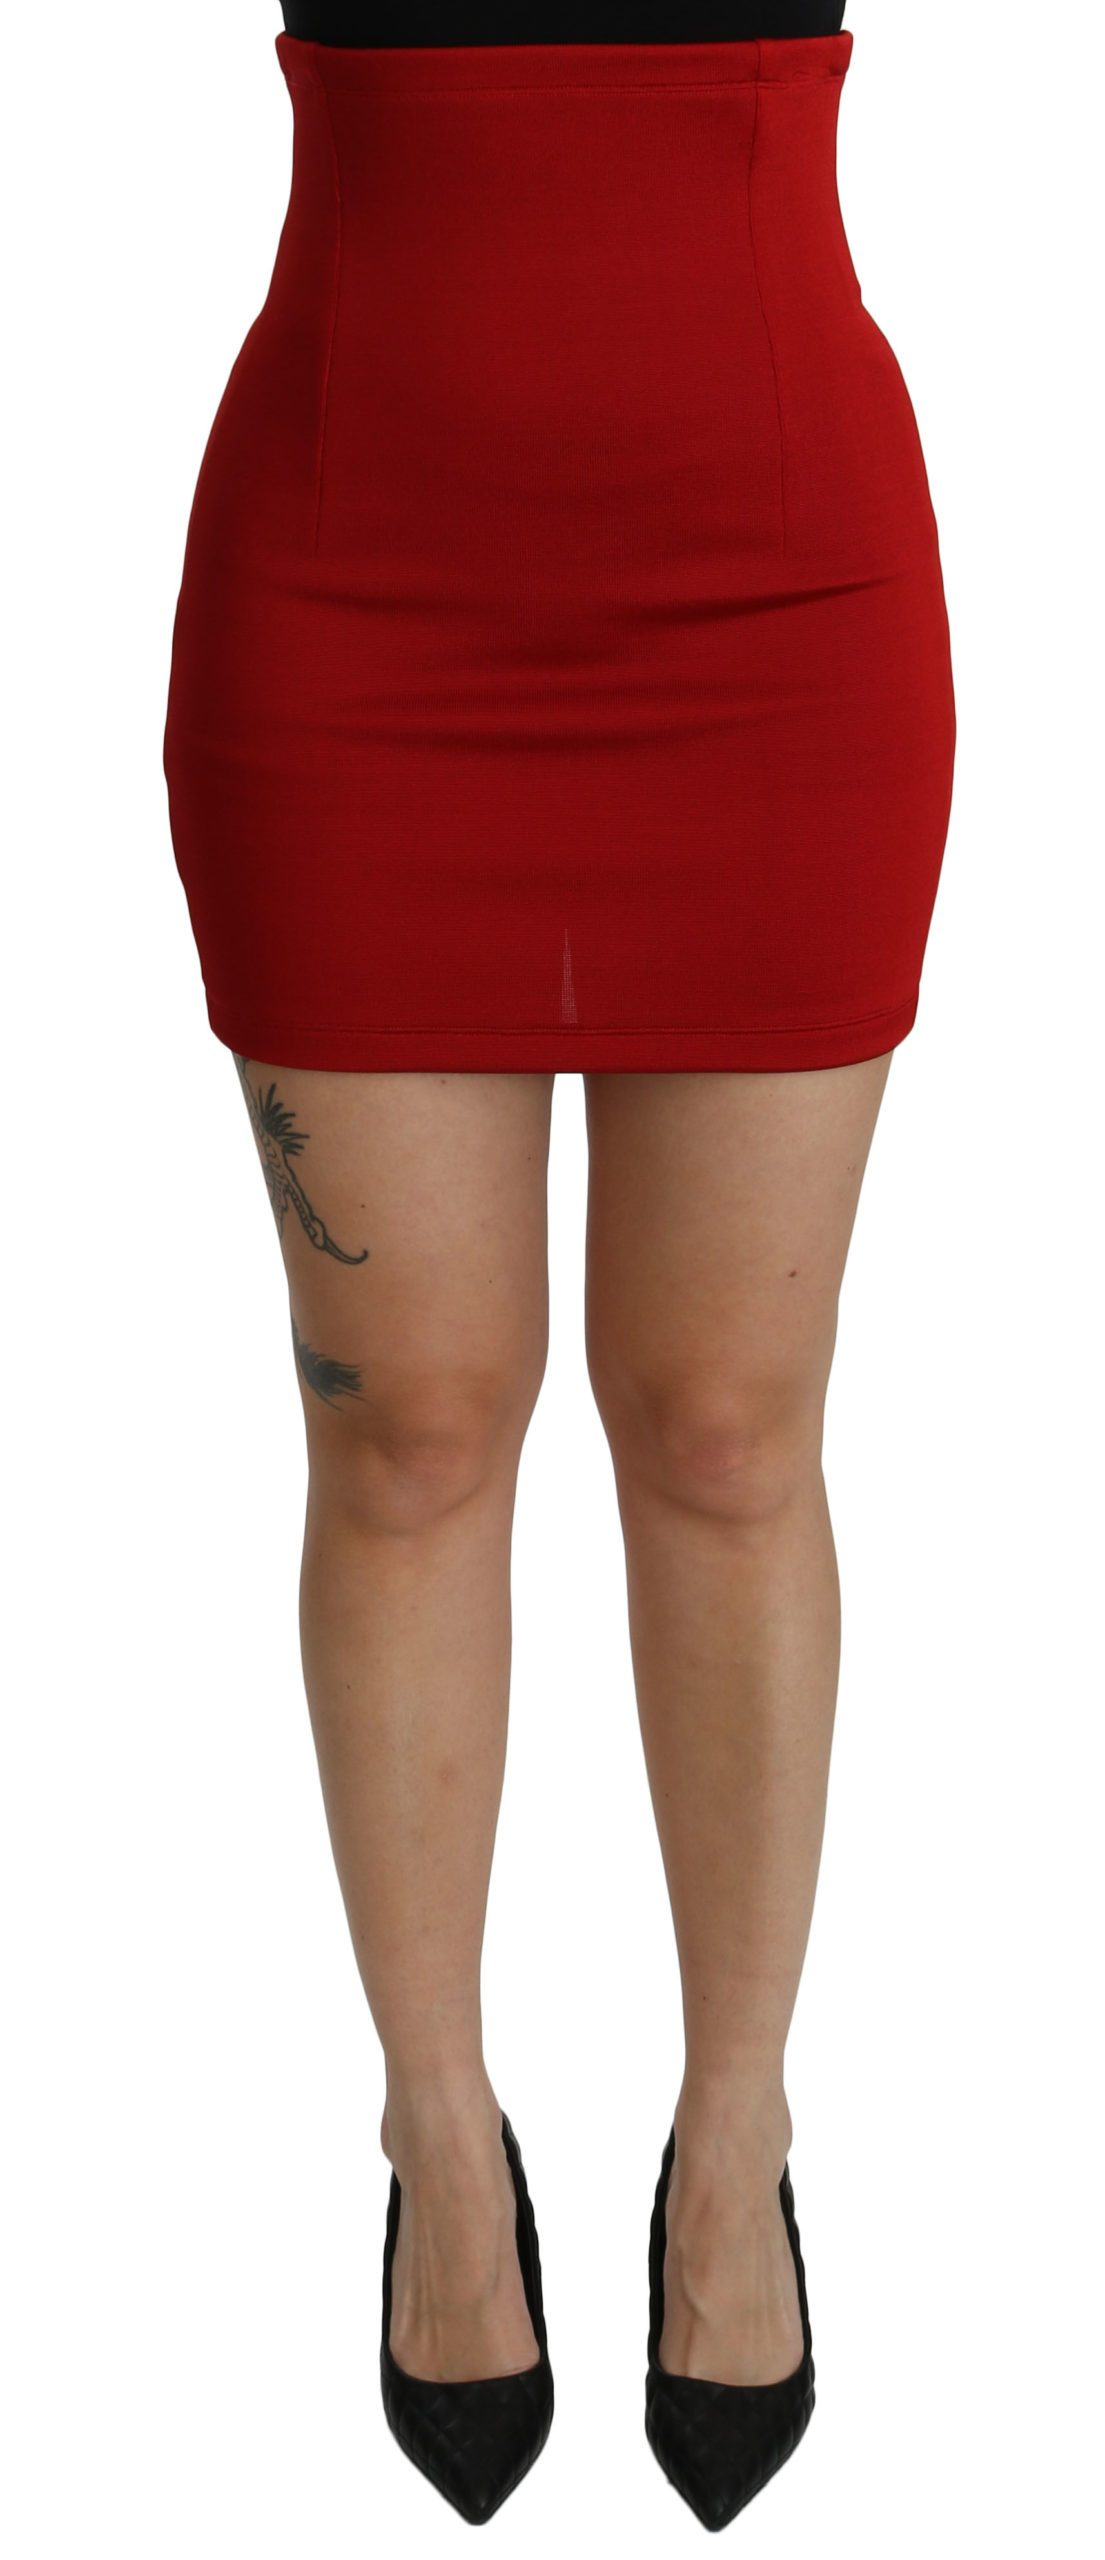 Dolce & Gabbana Women's High Waist Mini Viscose Skirt Red SKI1379 - IT40|S